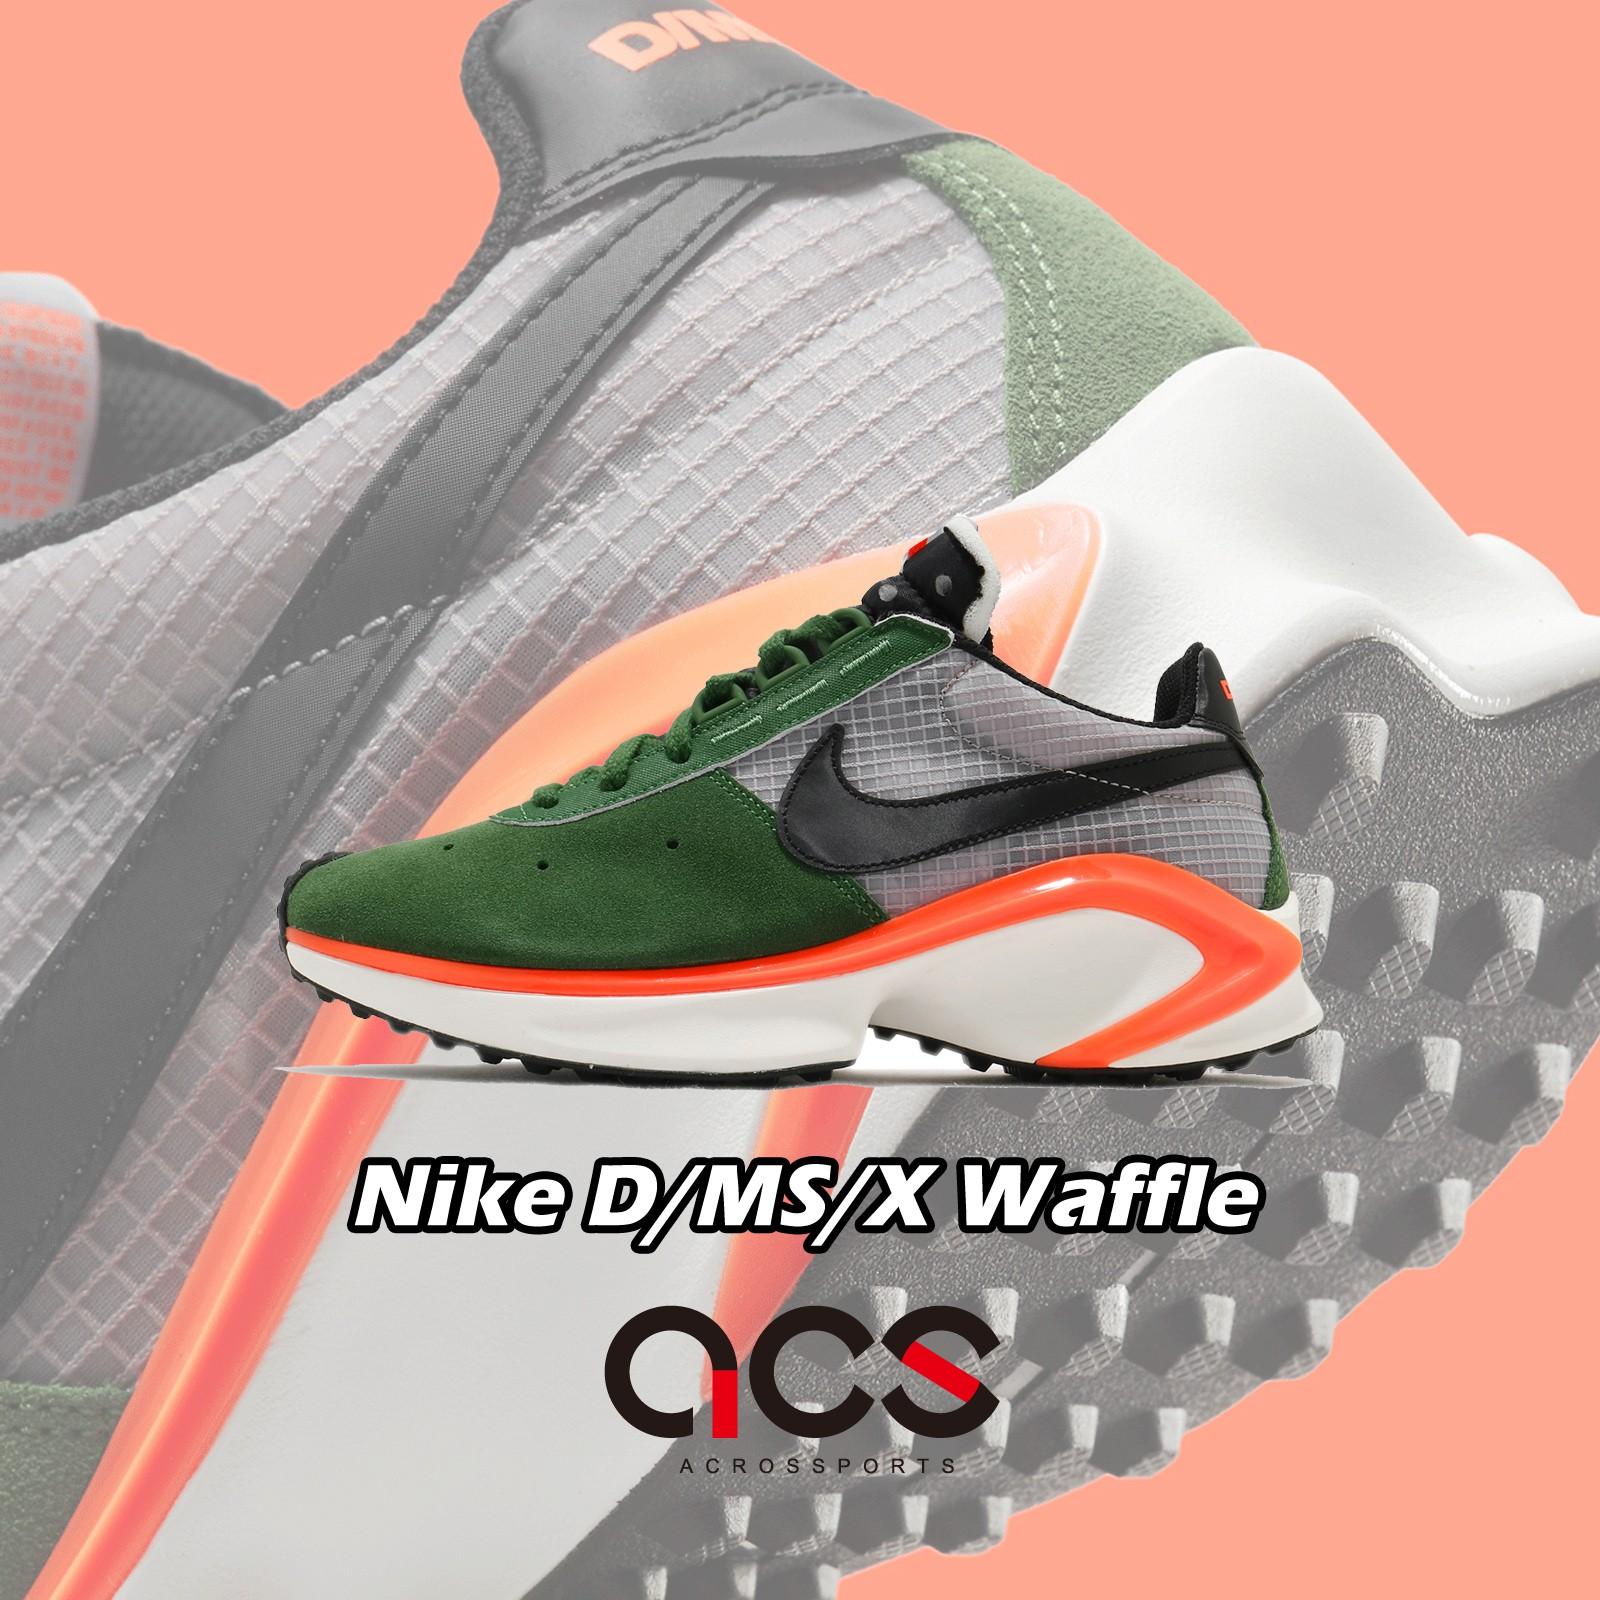 Nike 休閒鞋 D/MS/X Waffle 綠 黑 橘 男鞋 解構 厚底 麂皮 【ACS】 CQ0205-300